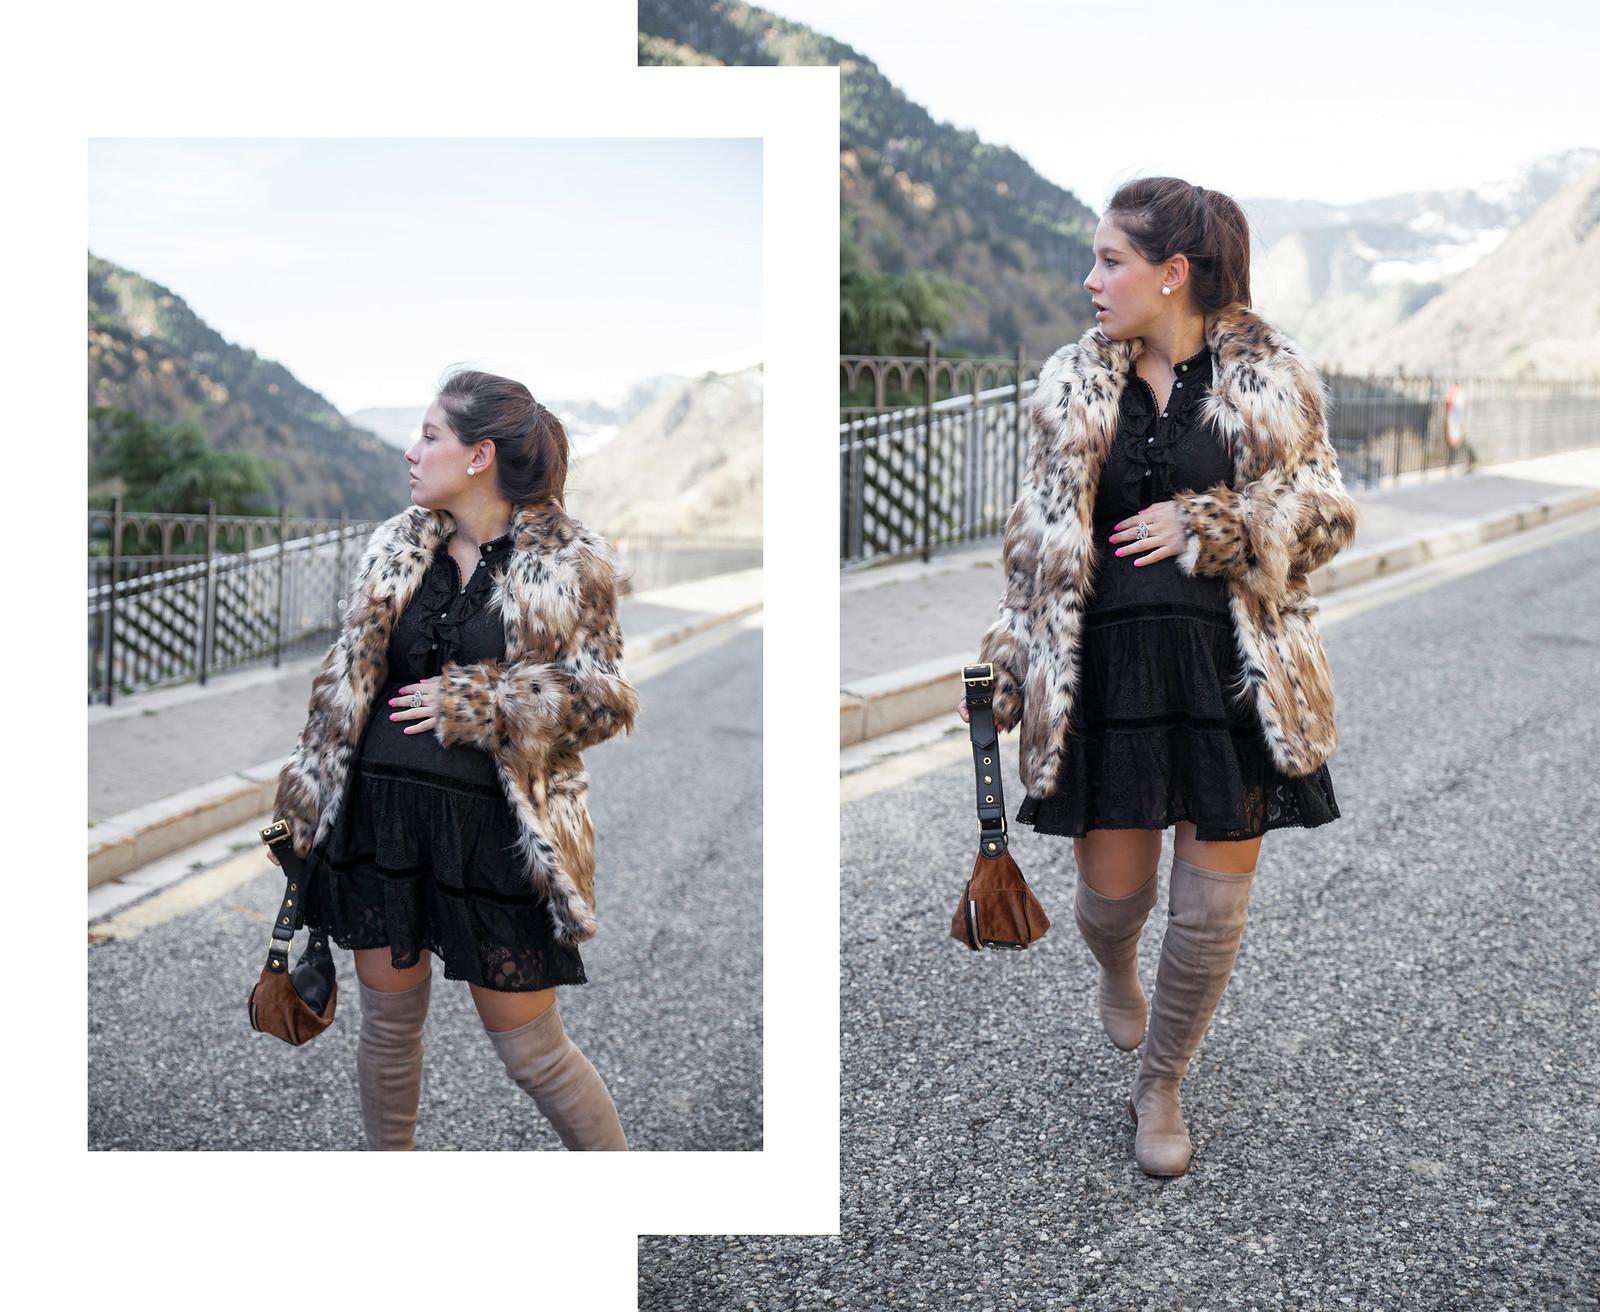 06_Leopard_print_coat_fur_majorelle_theguestgirl_highly_preppy_vestido_plumeti_little_black_dress_lbd_pregnant_chaqueta_leopardo_revolve